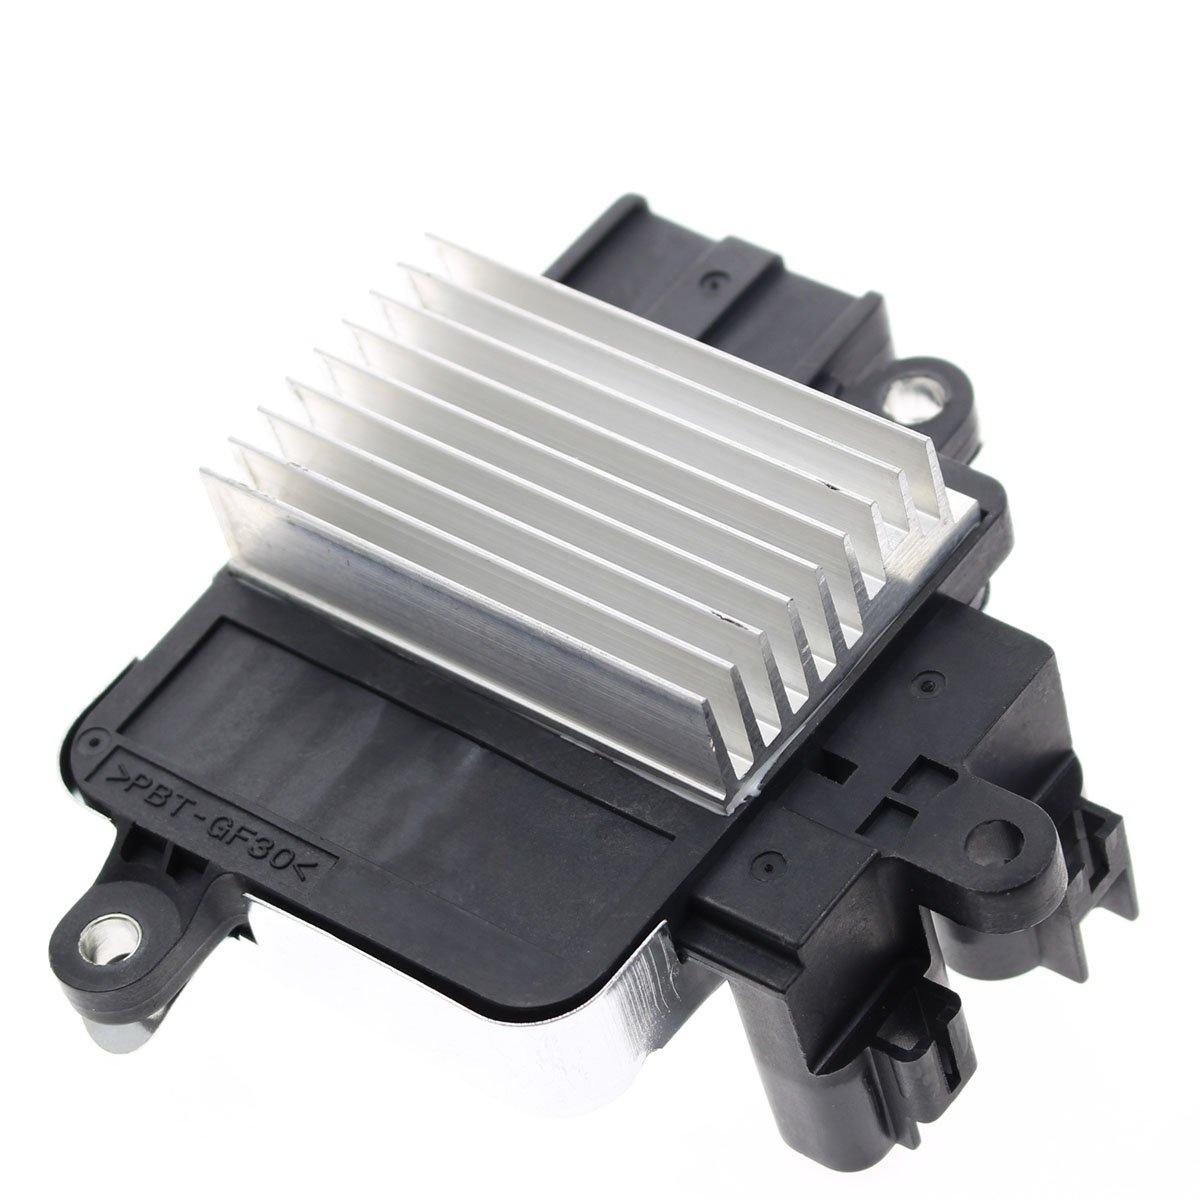 AUTOKAY Radiator Cooling Fan Control Module Unit ECU for Toyota RAV4 Sienna Lexus ES350